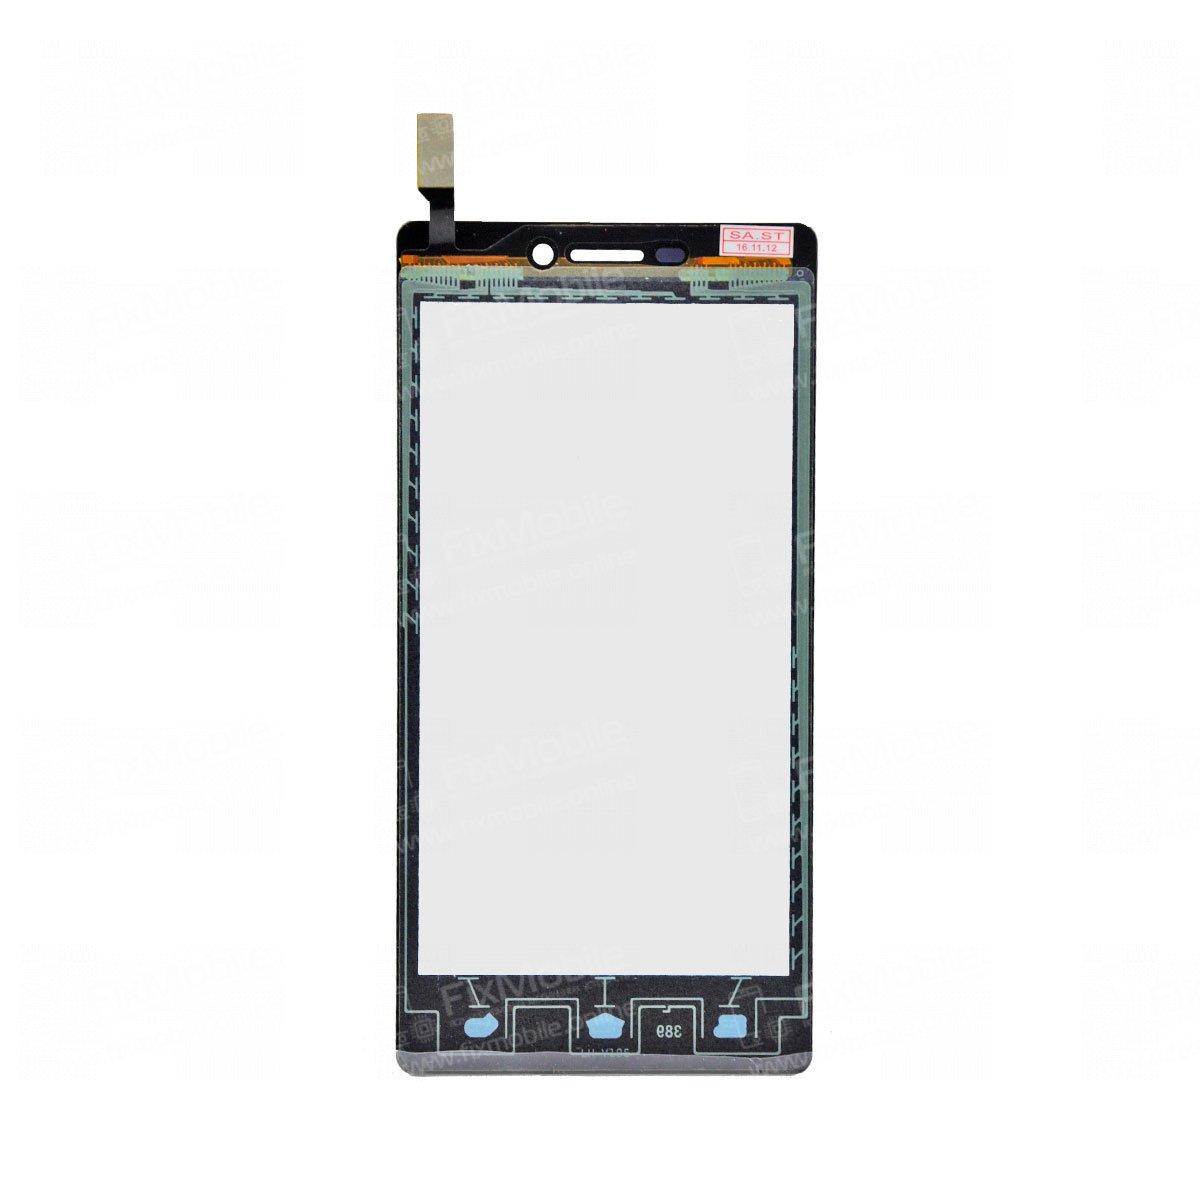 Тачскрин (сенсор) для Fly Evo Energie 4 (IQ4501) (черный)